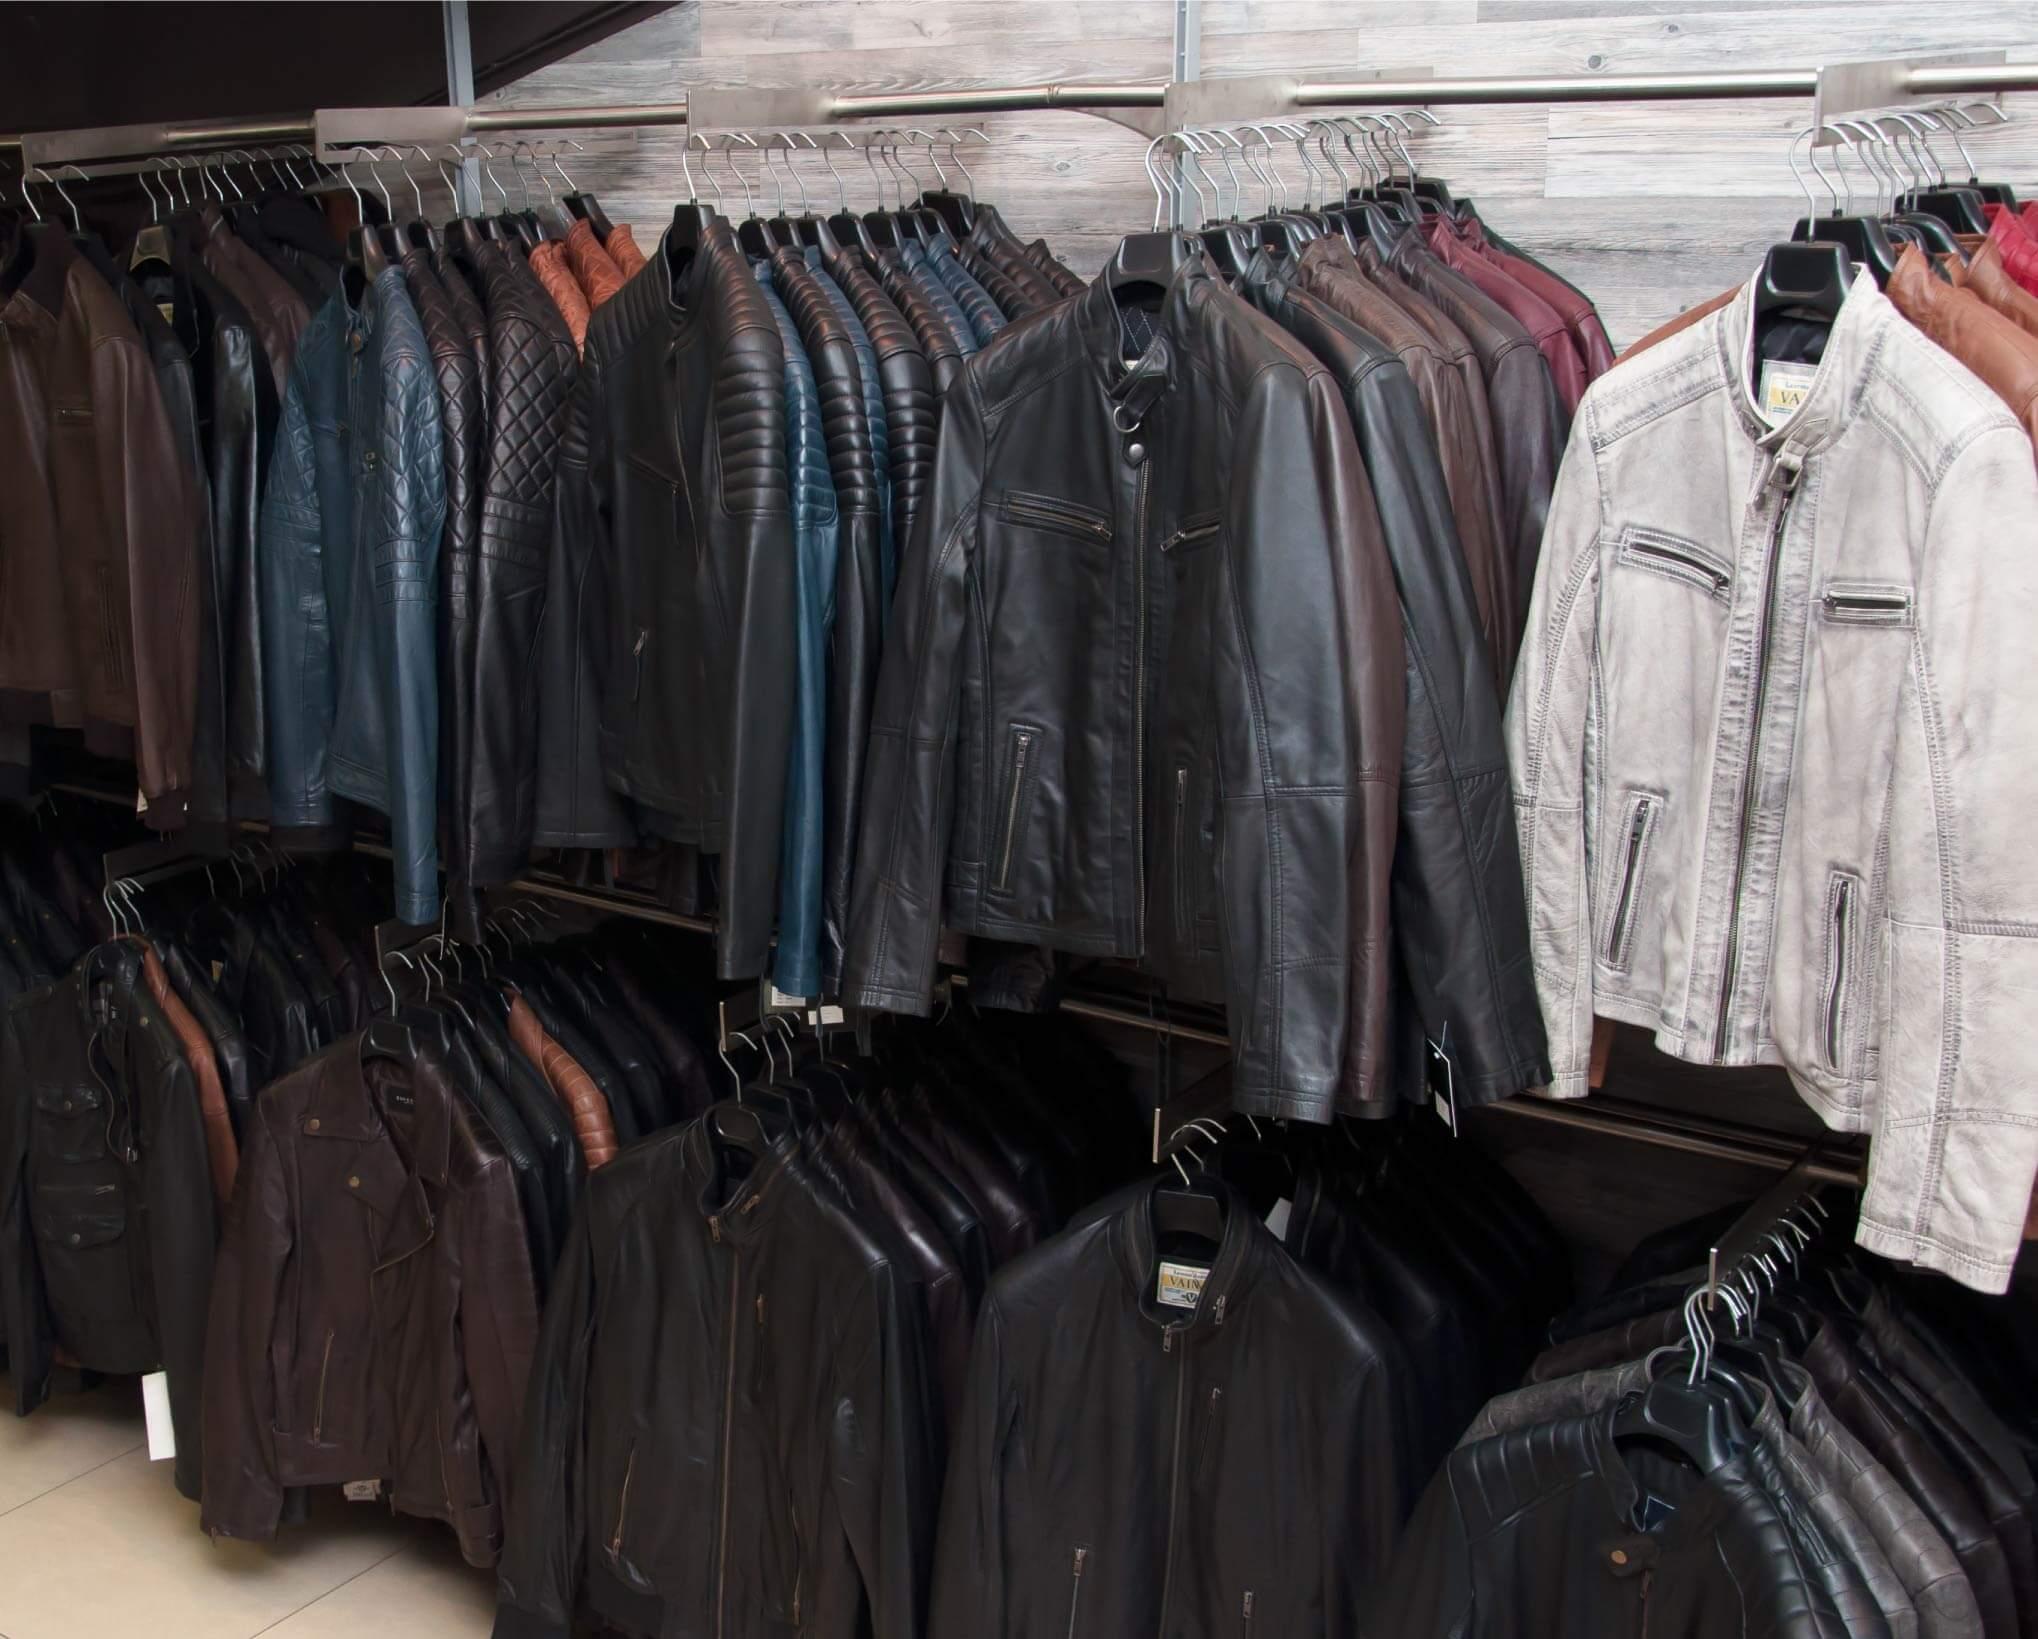 H0dcbfde5b7e14b4787d69d85579515a6X VAINAS European Brand Mens Genuine Leather jacket for men Winter Real sheep leather jacket Motorcycle jackets Biker jackets Alfa